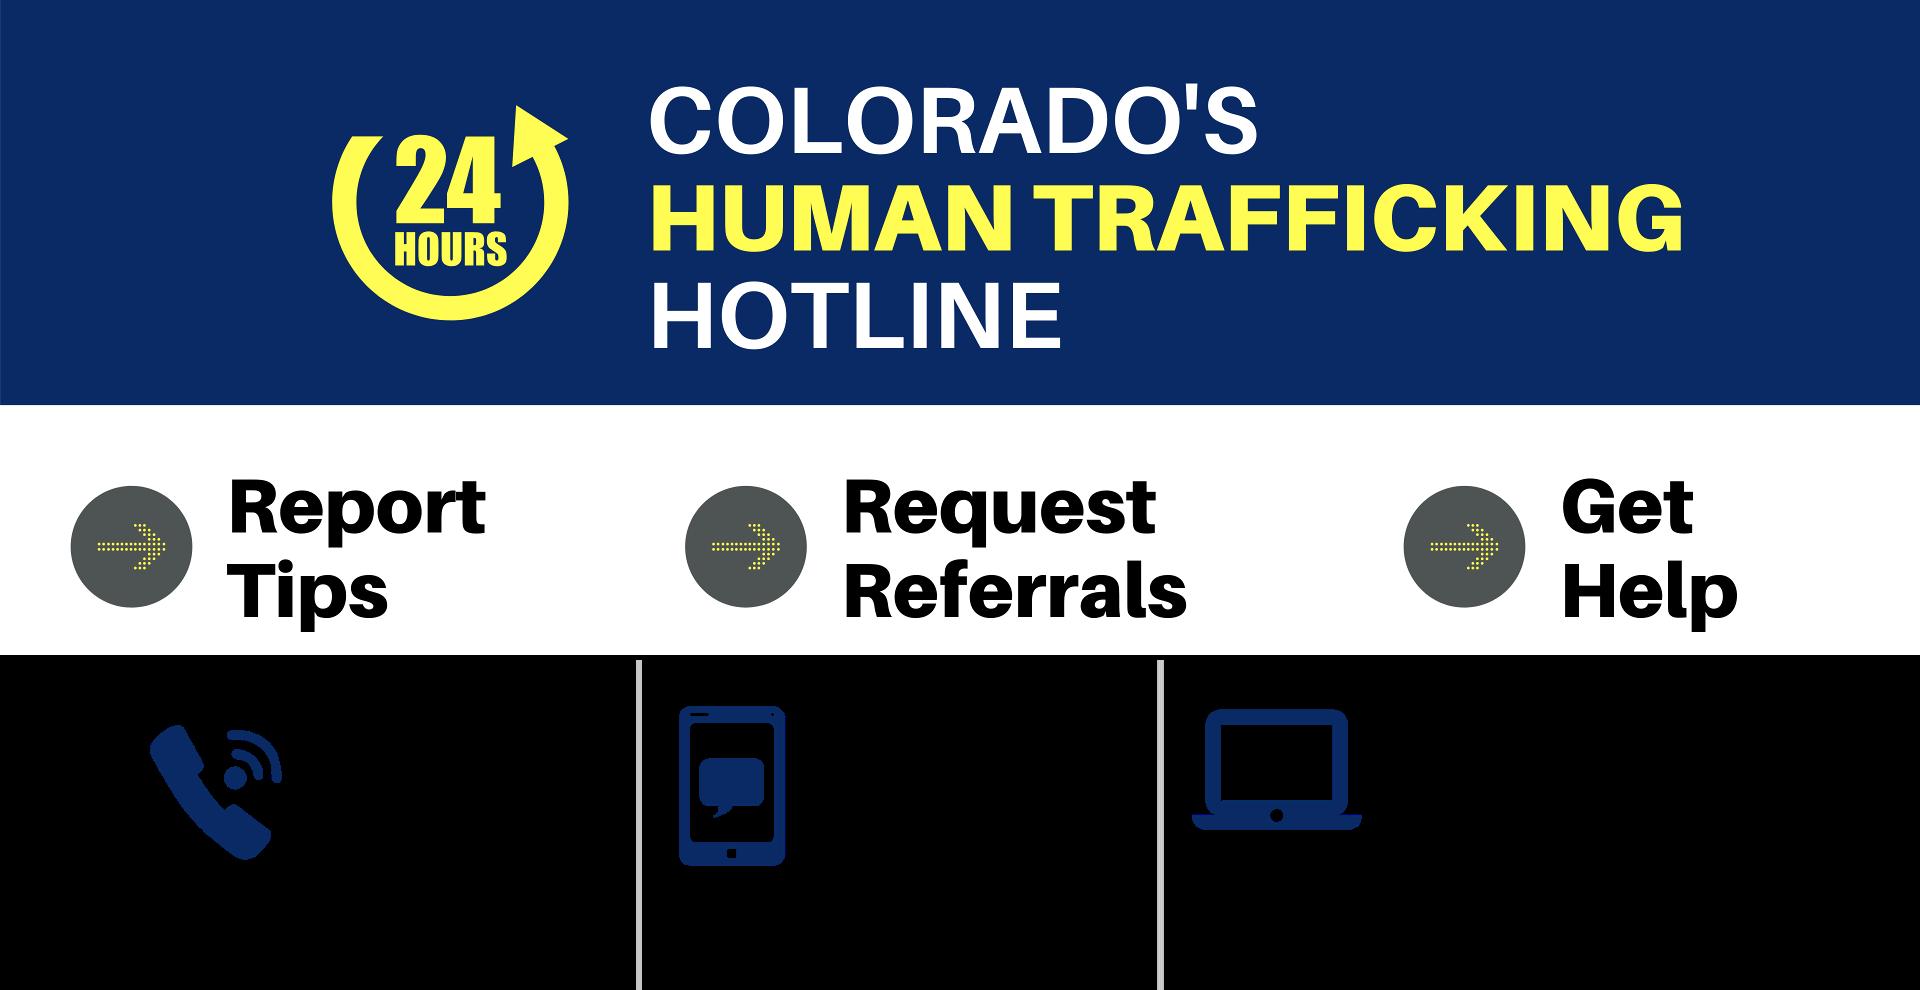 Colorado's Human Trafficking Hotline: Online resource Directory